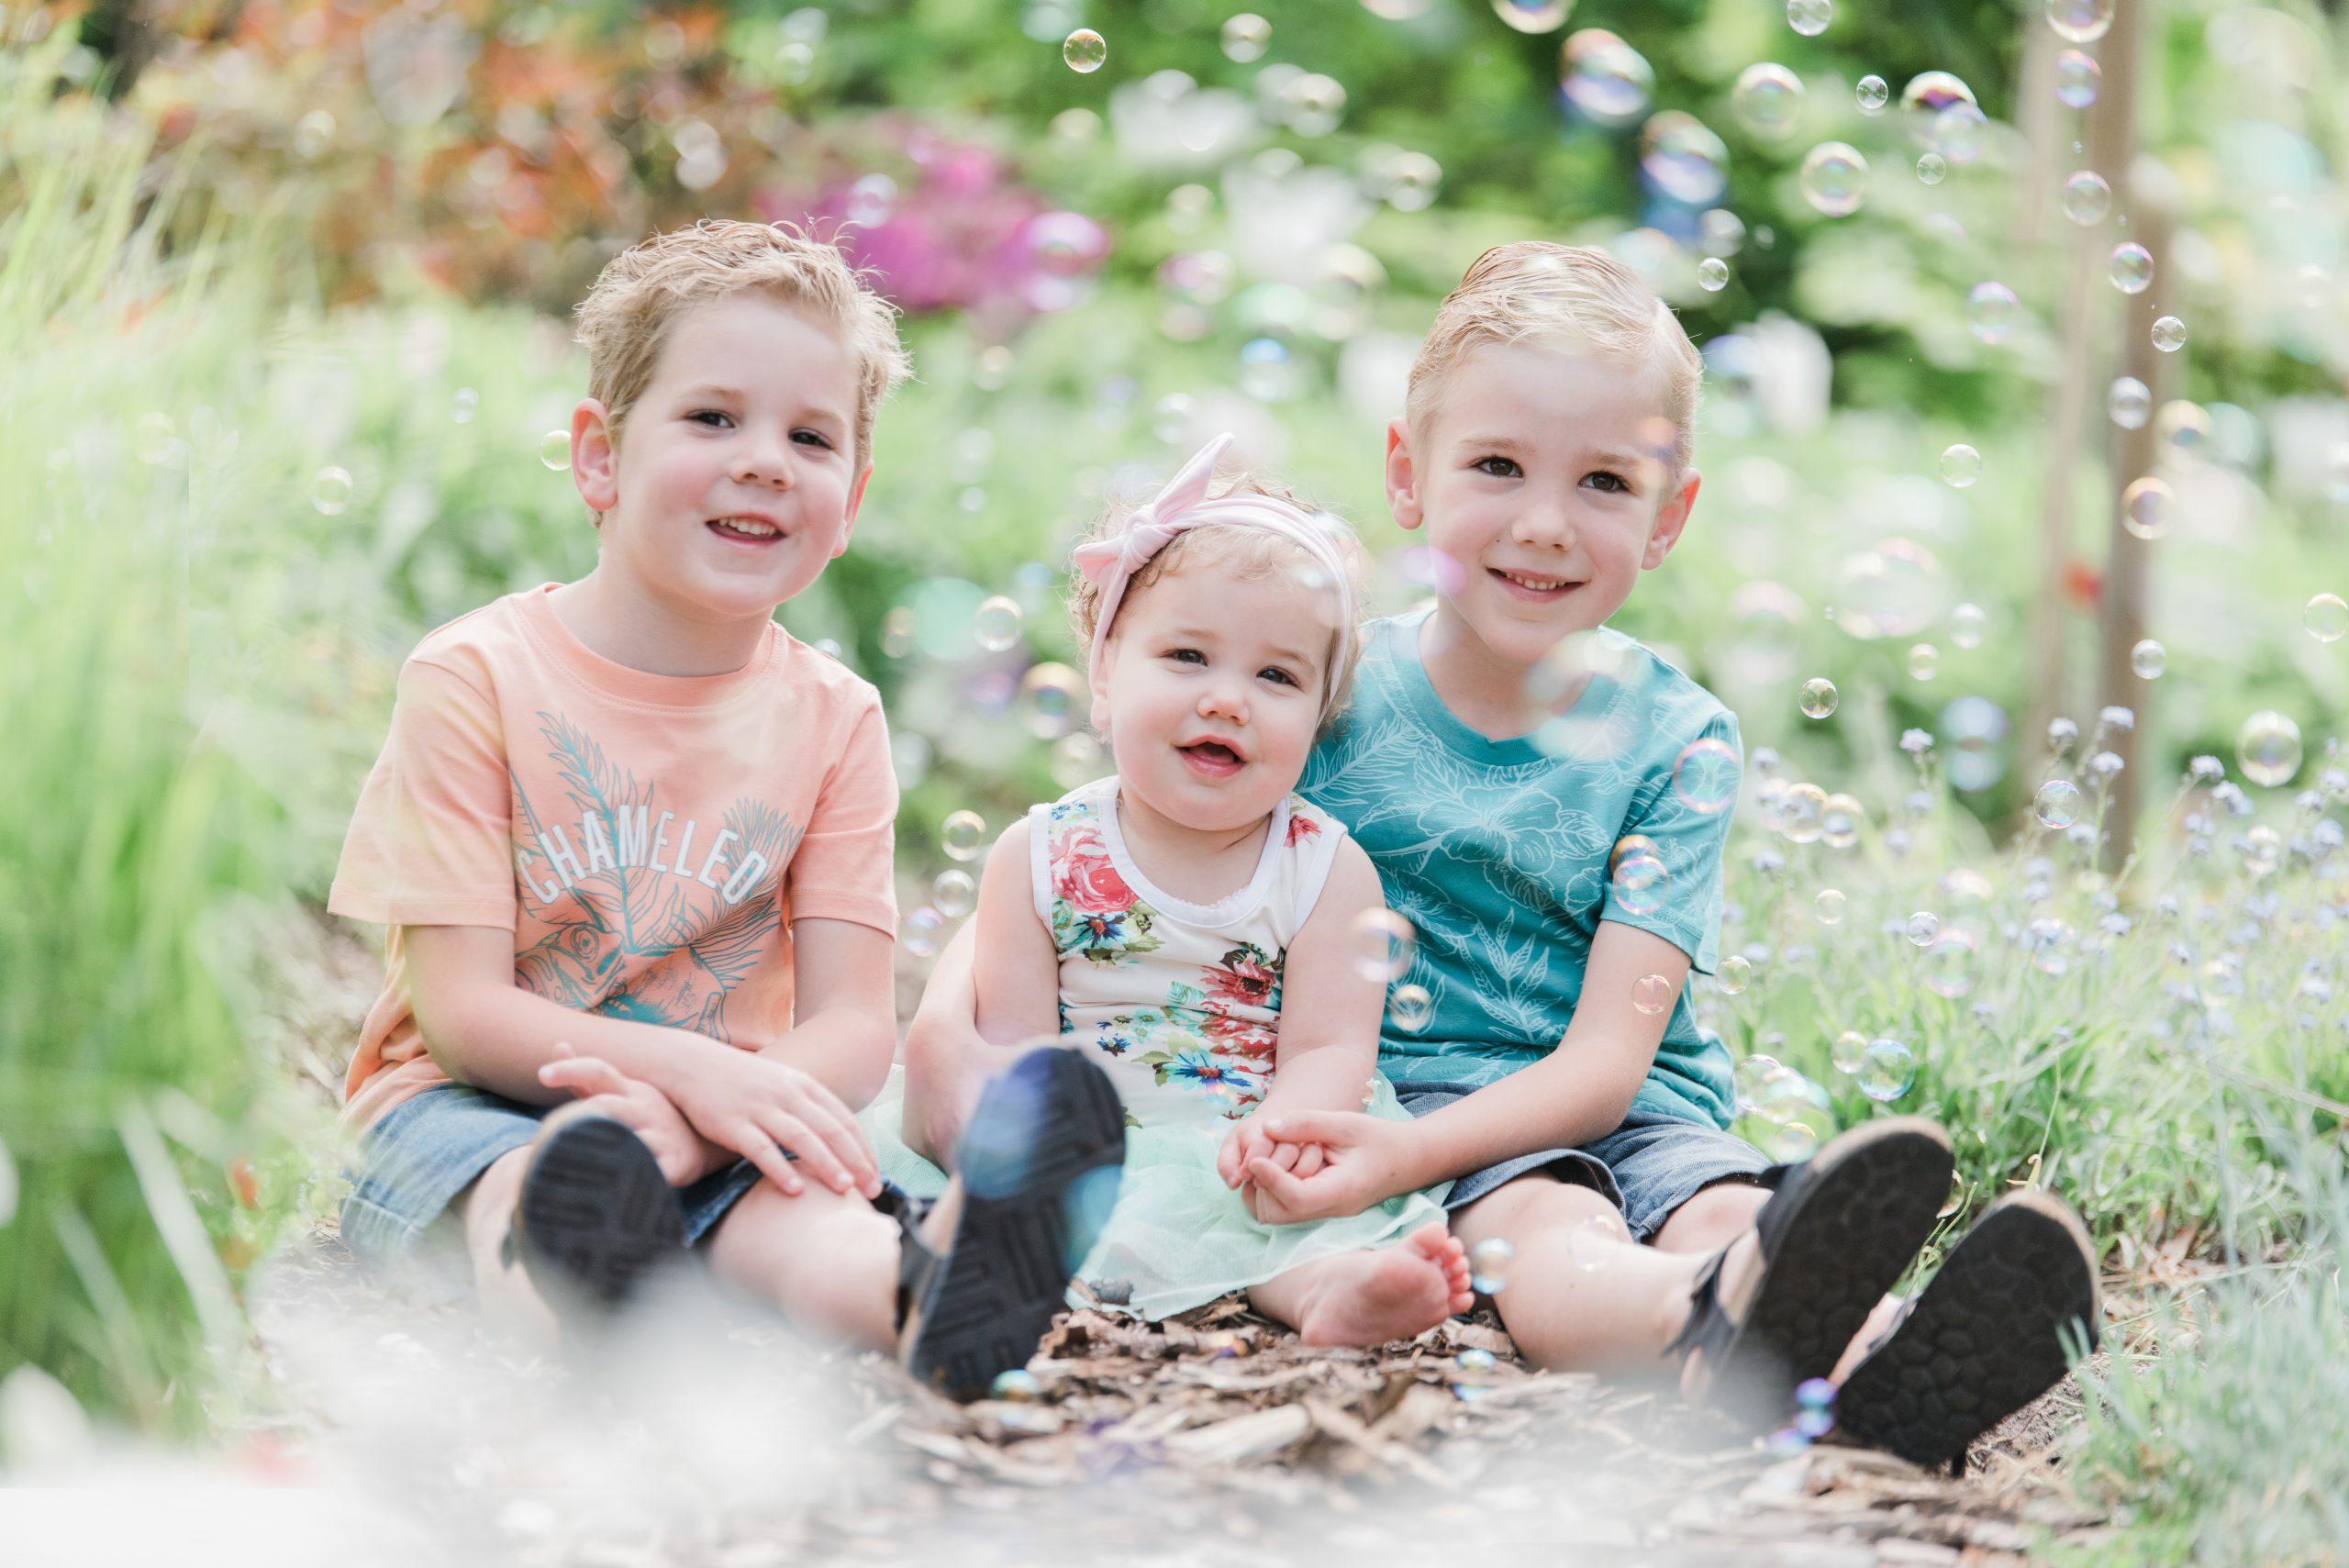 Chantal-Nijhof-Studio-Fotografie-Fotograaf-Heerde-Epe-Oene-Wapenveld-Veessen-Kids-fotoshoot-Kinder-fotoshoot-bellenblaas-scaled